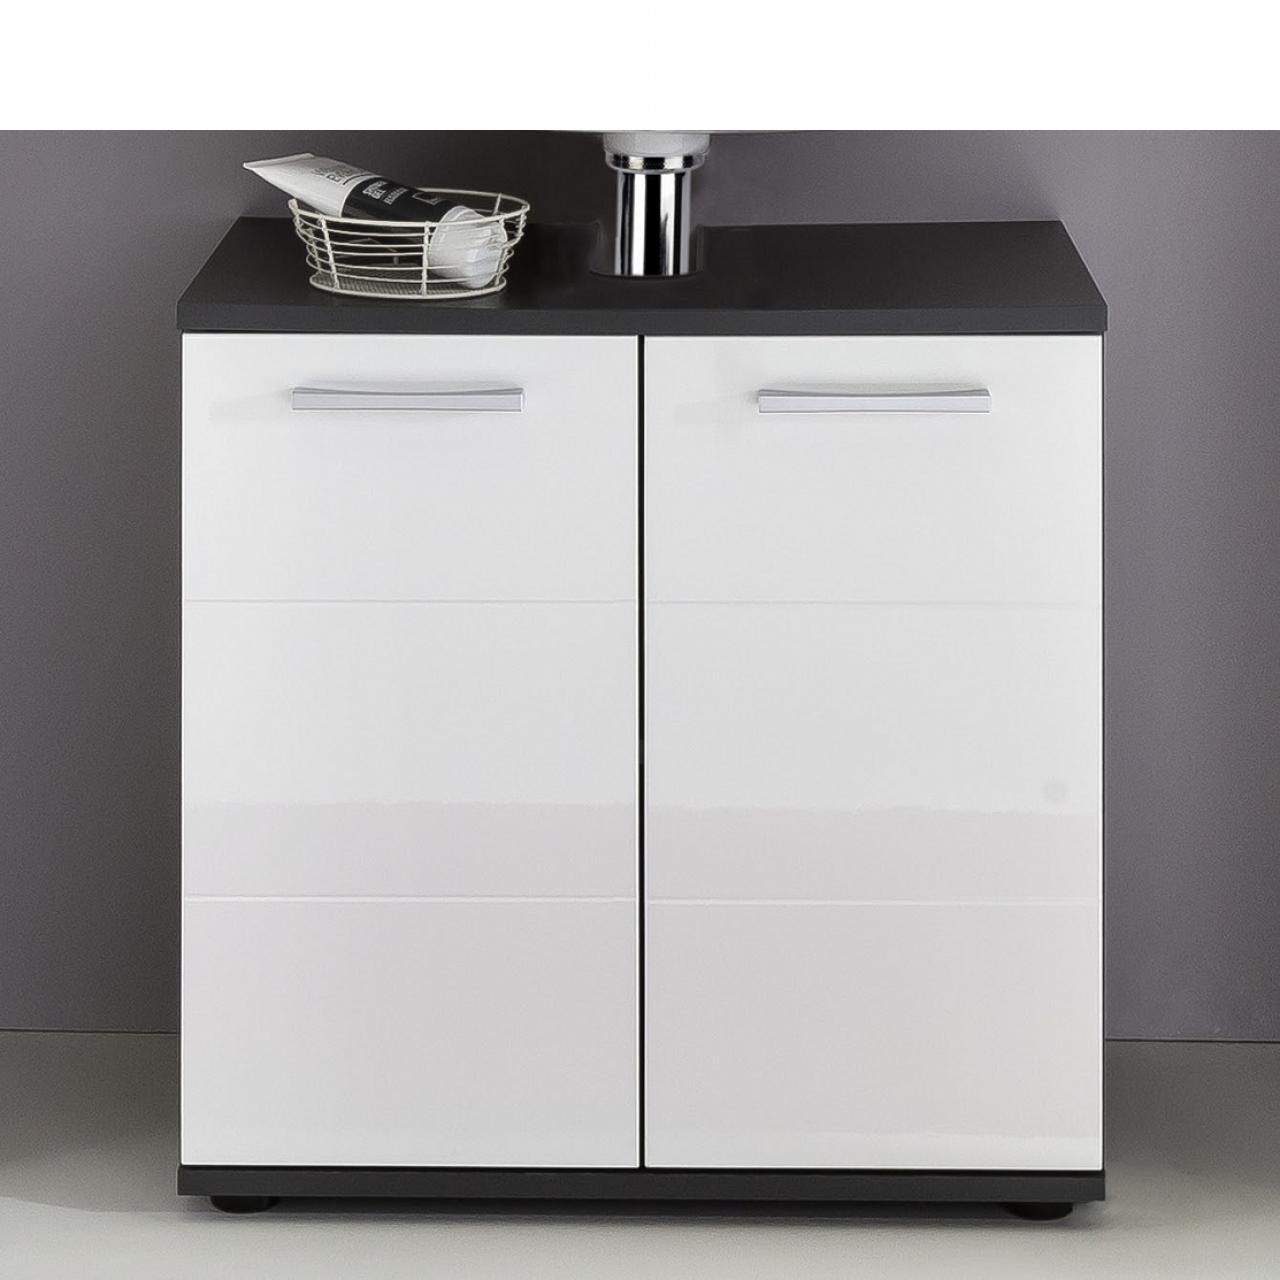 Waschbeckenunterschrank Smart- Weiss/Grau